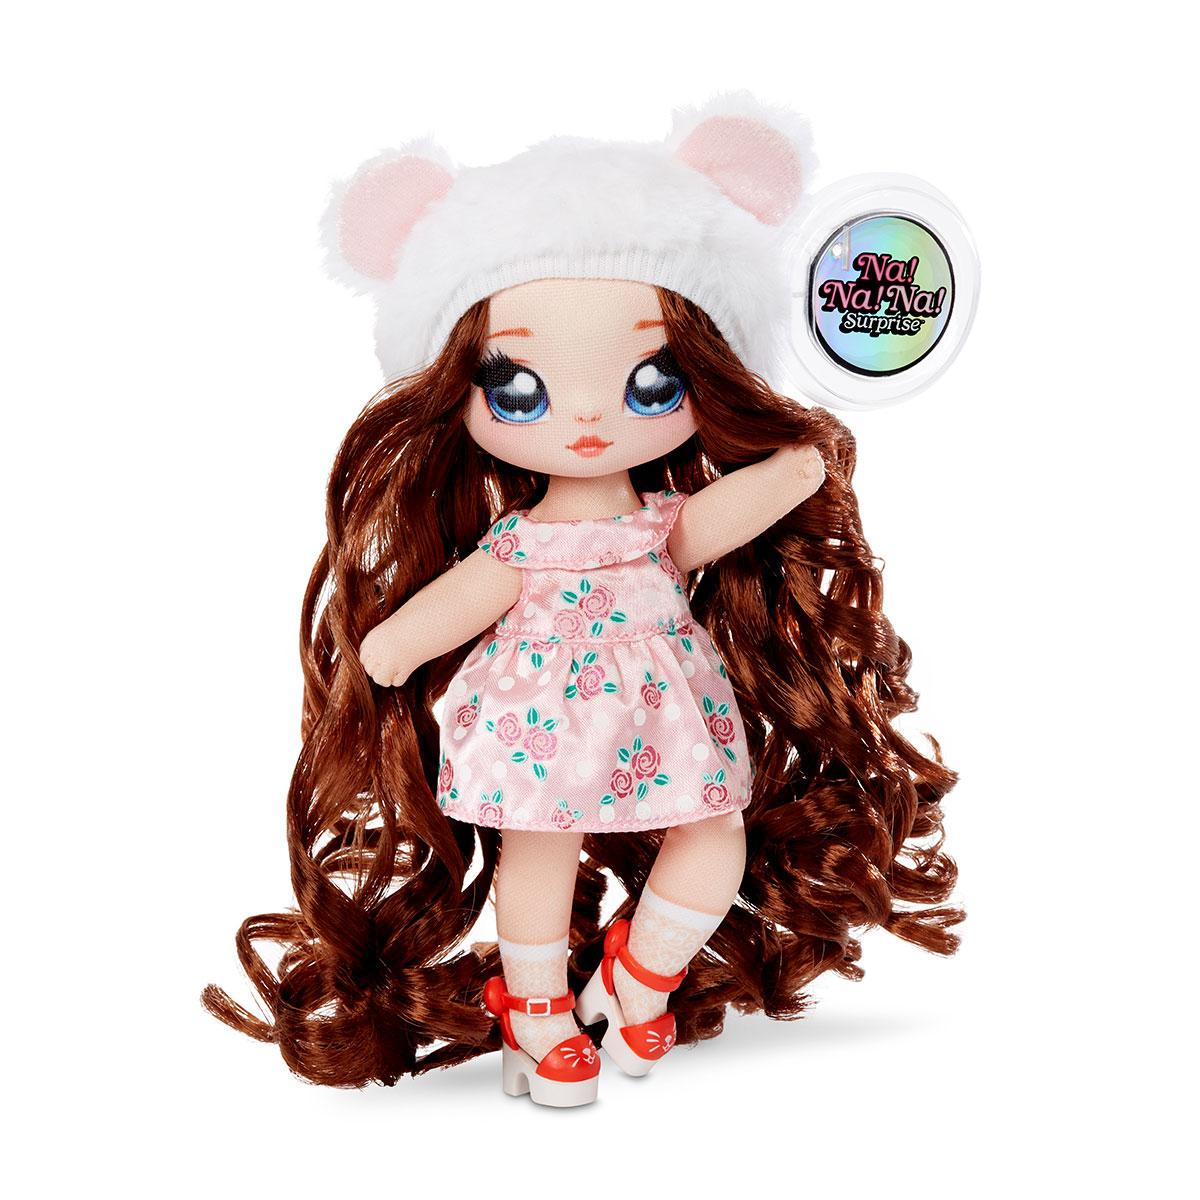 Кукла Na na na surprise Мышка Маус